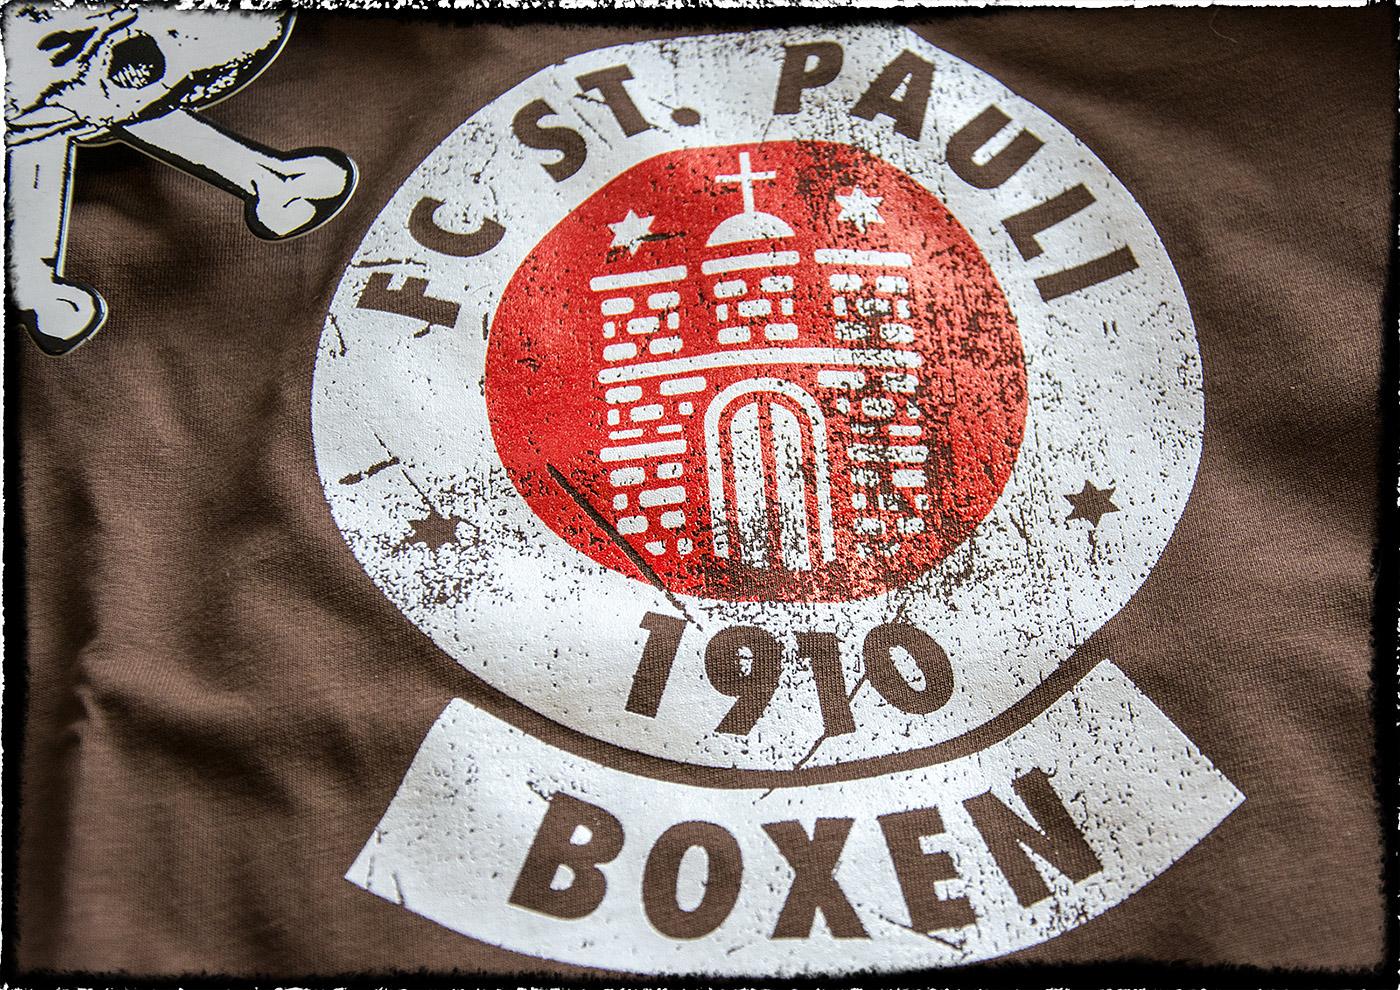 st pauli boxen